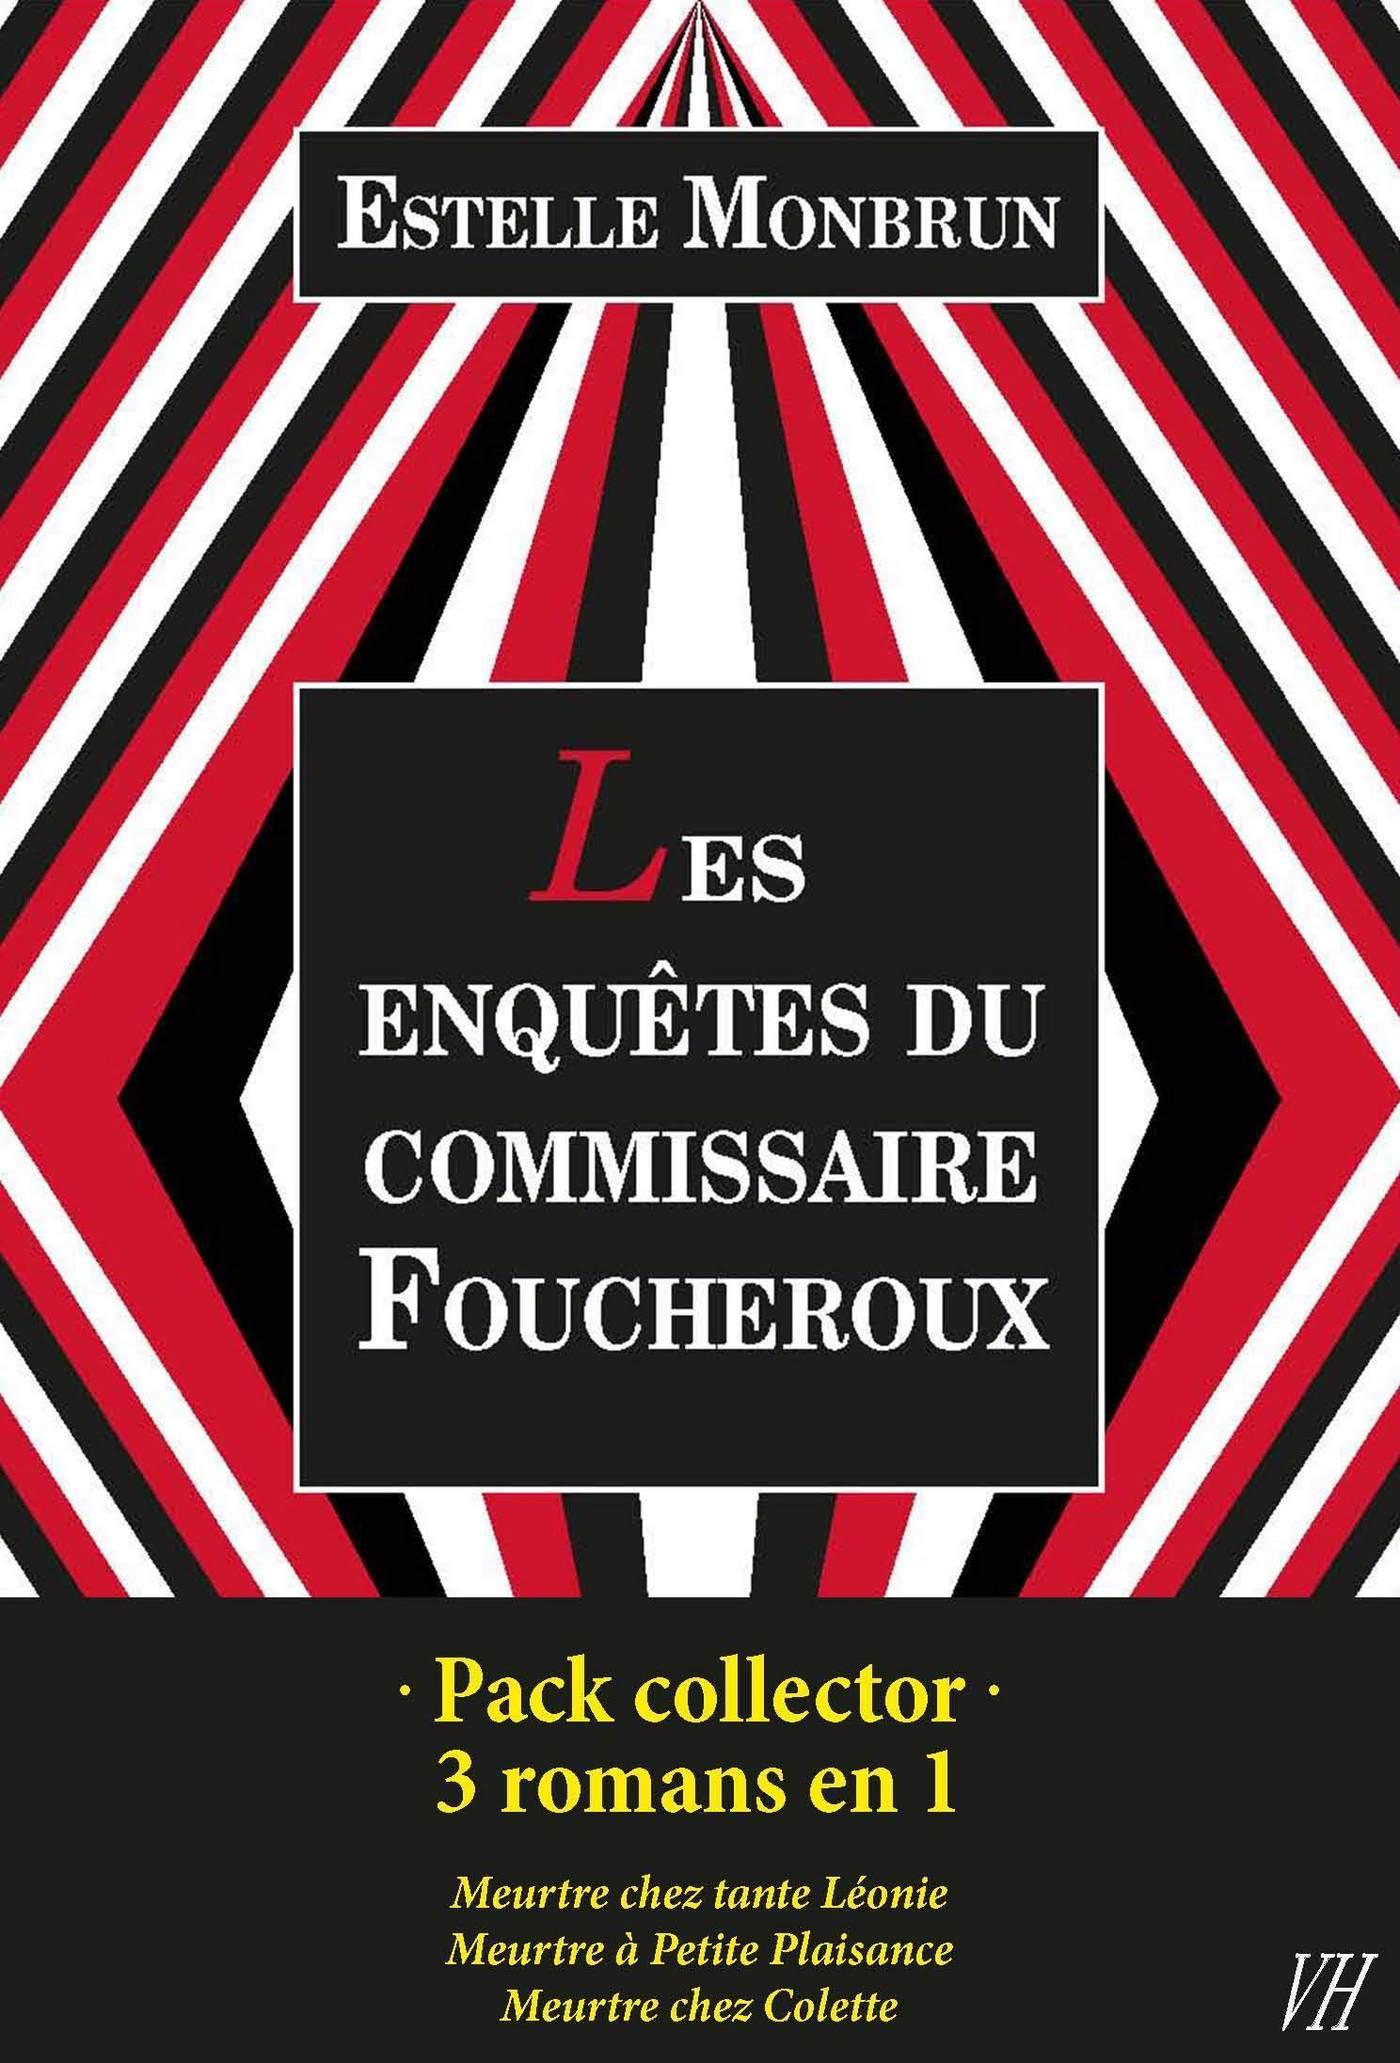 Pack collector Estelle Monb...